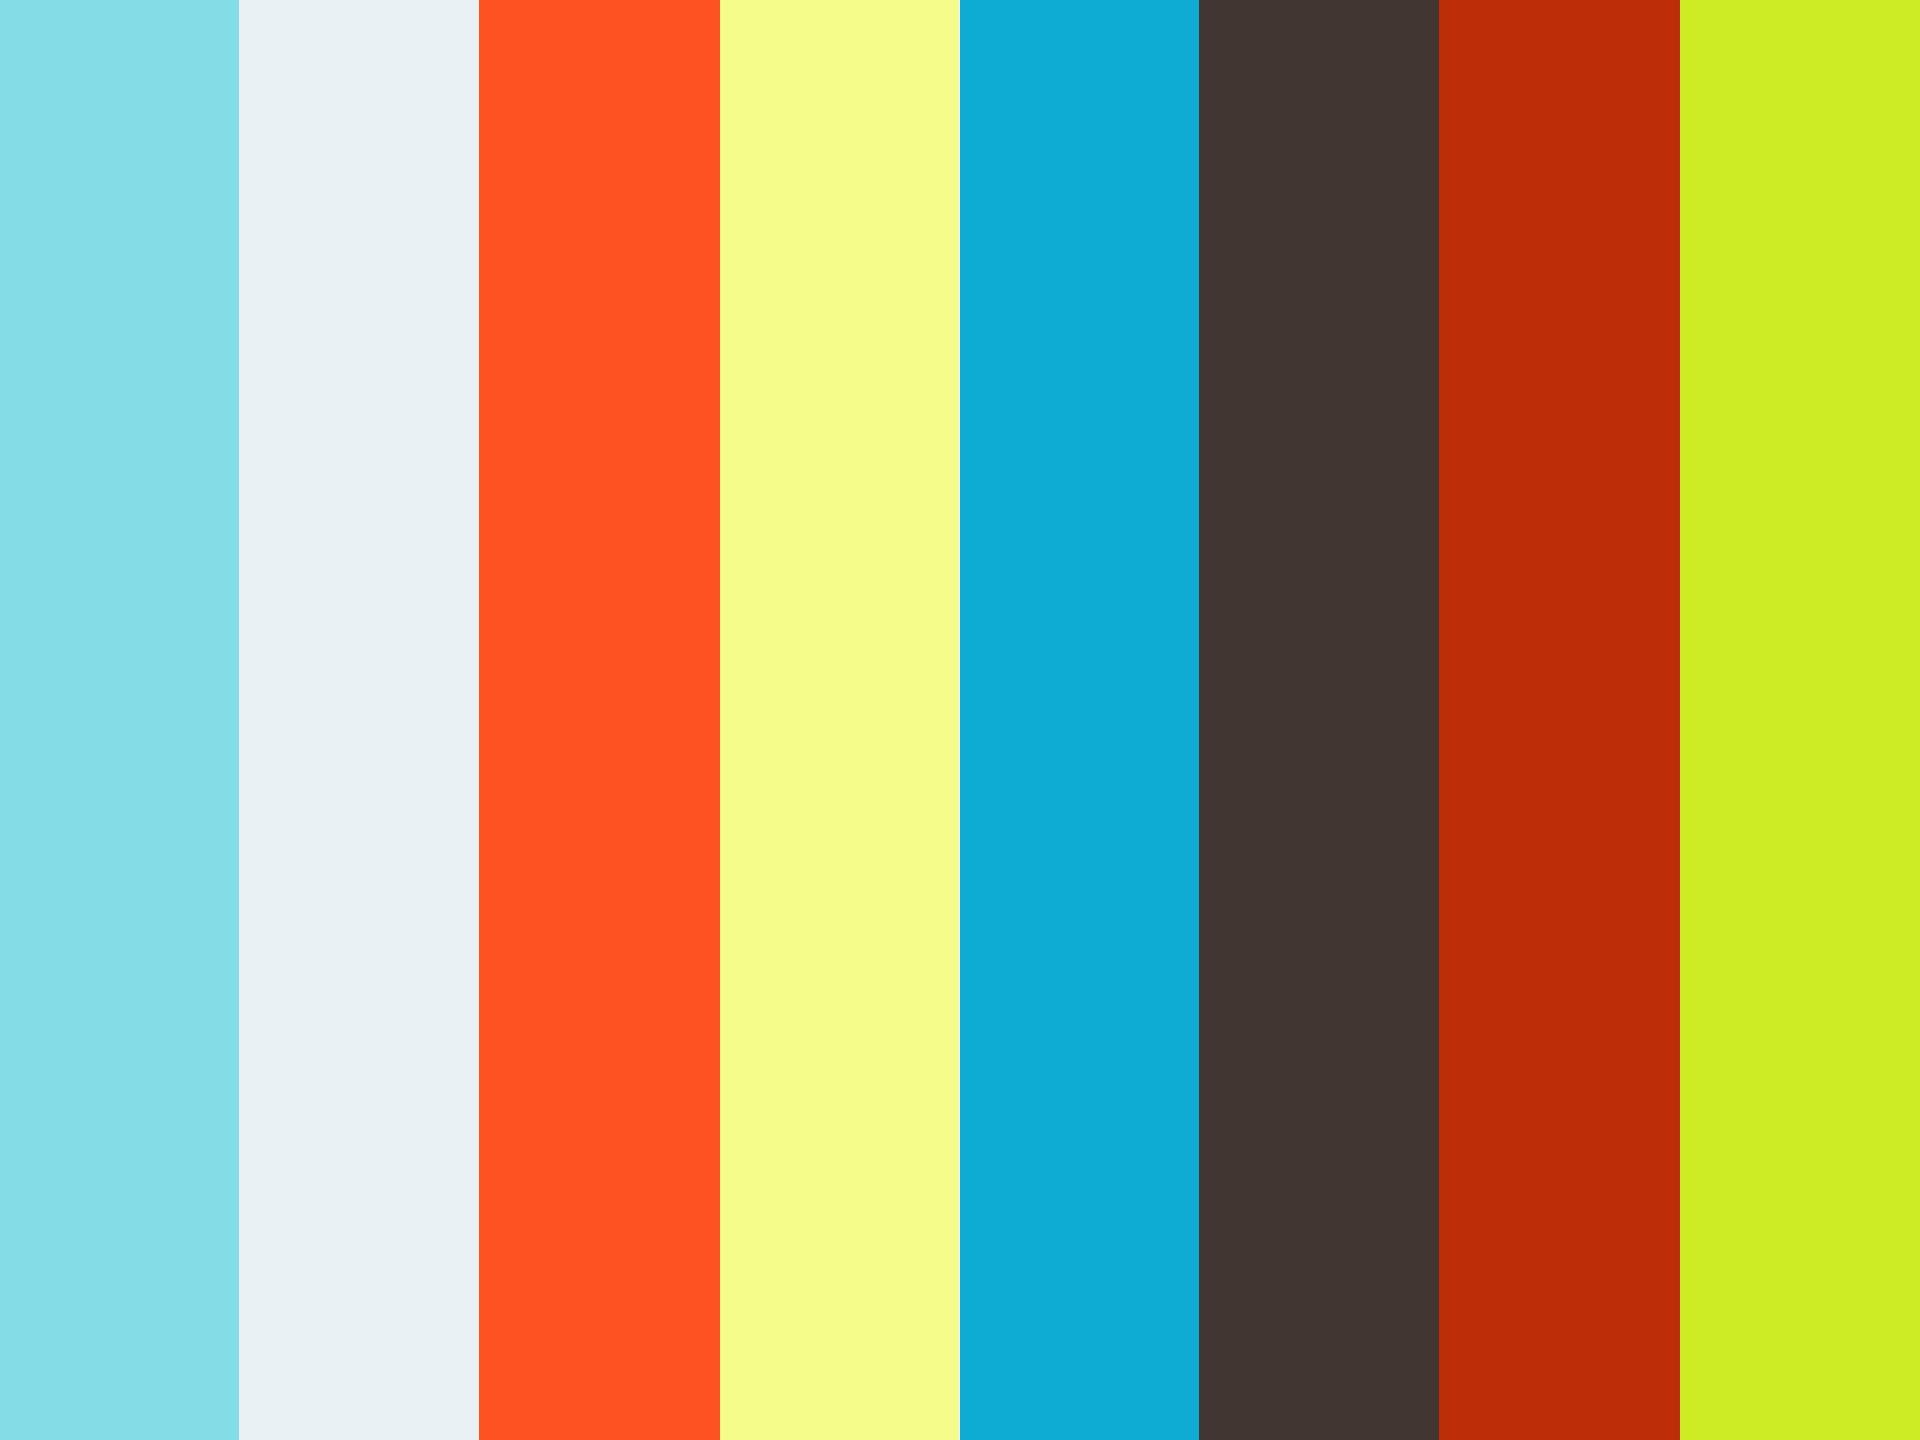 HYOSUNG AQUILA PRO GV 650 - GREY / BLACK - 2015